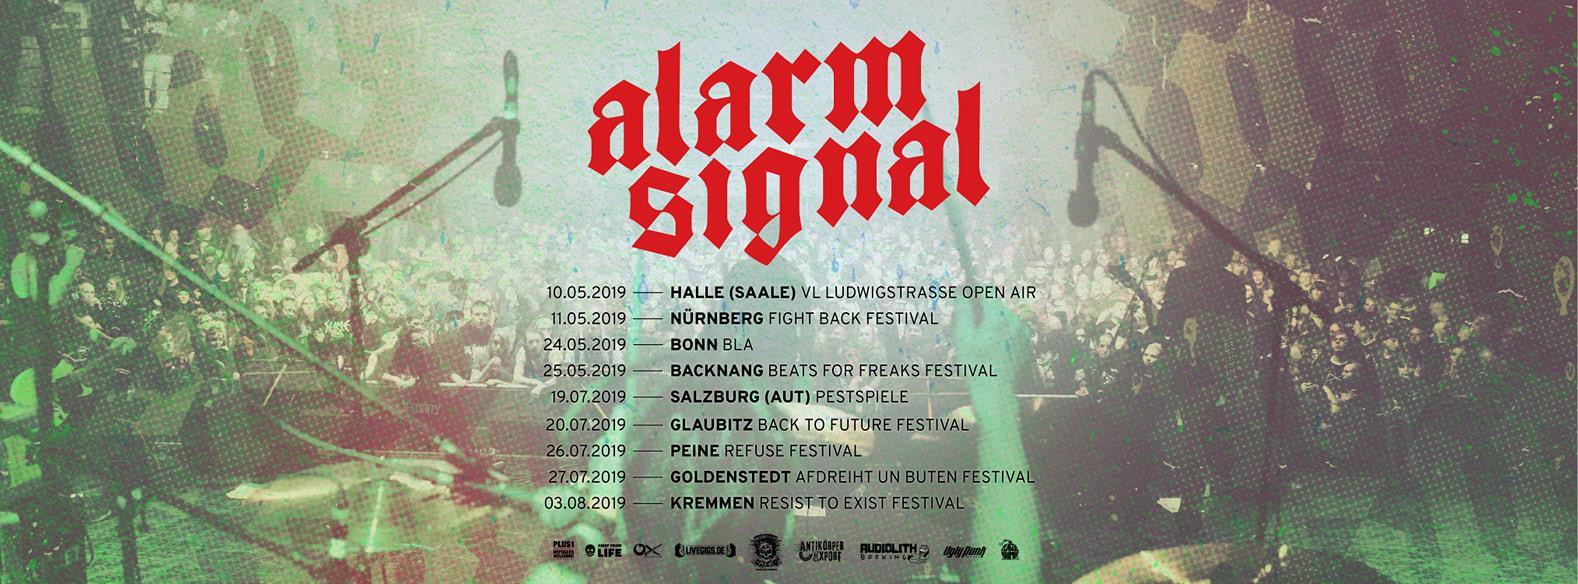 Alarmsignal Konzerte 2019